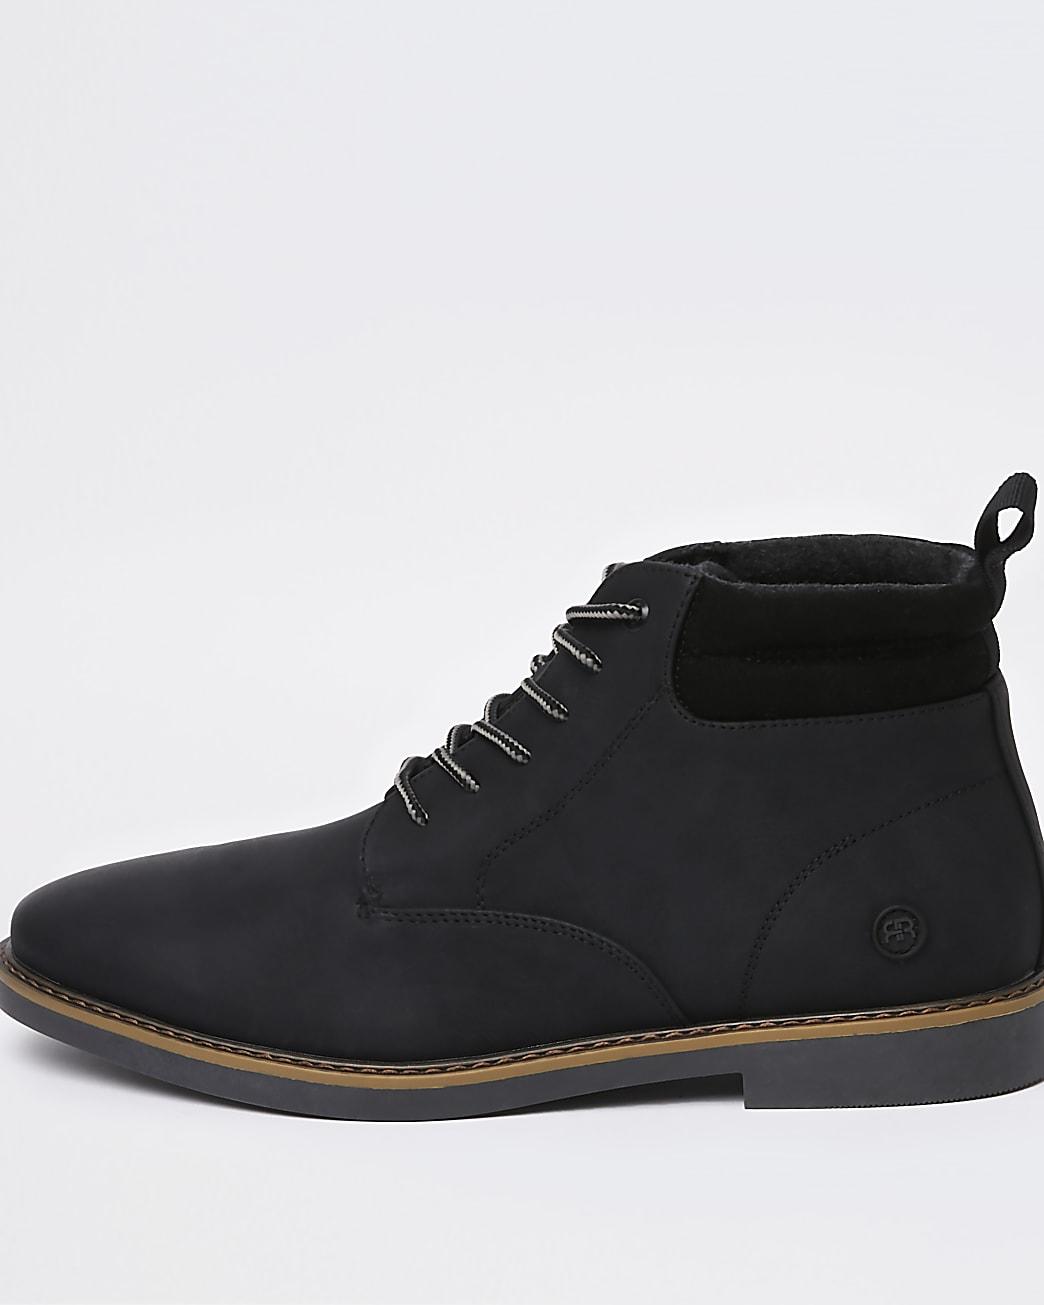 Black lace up chukka boots